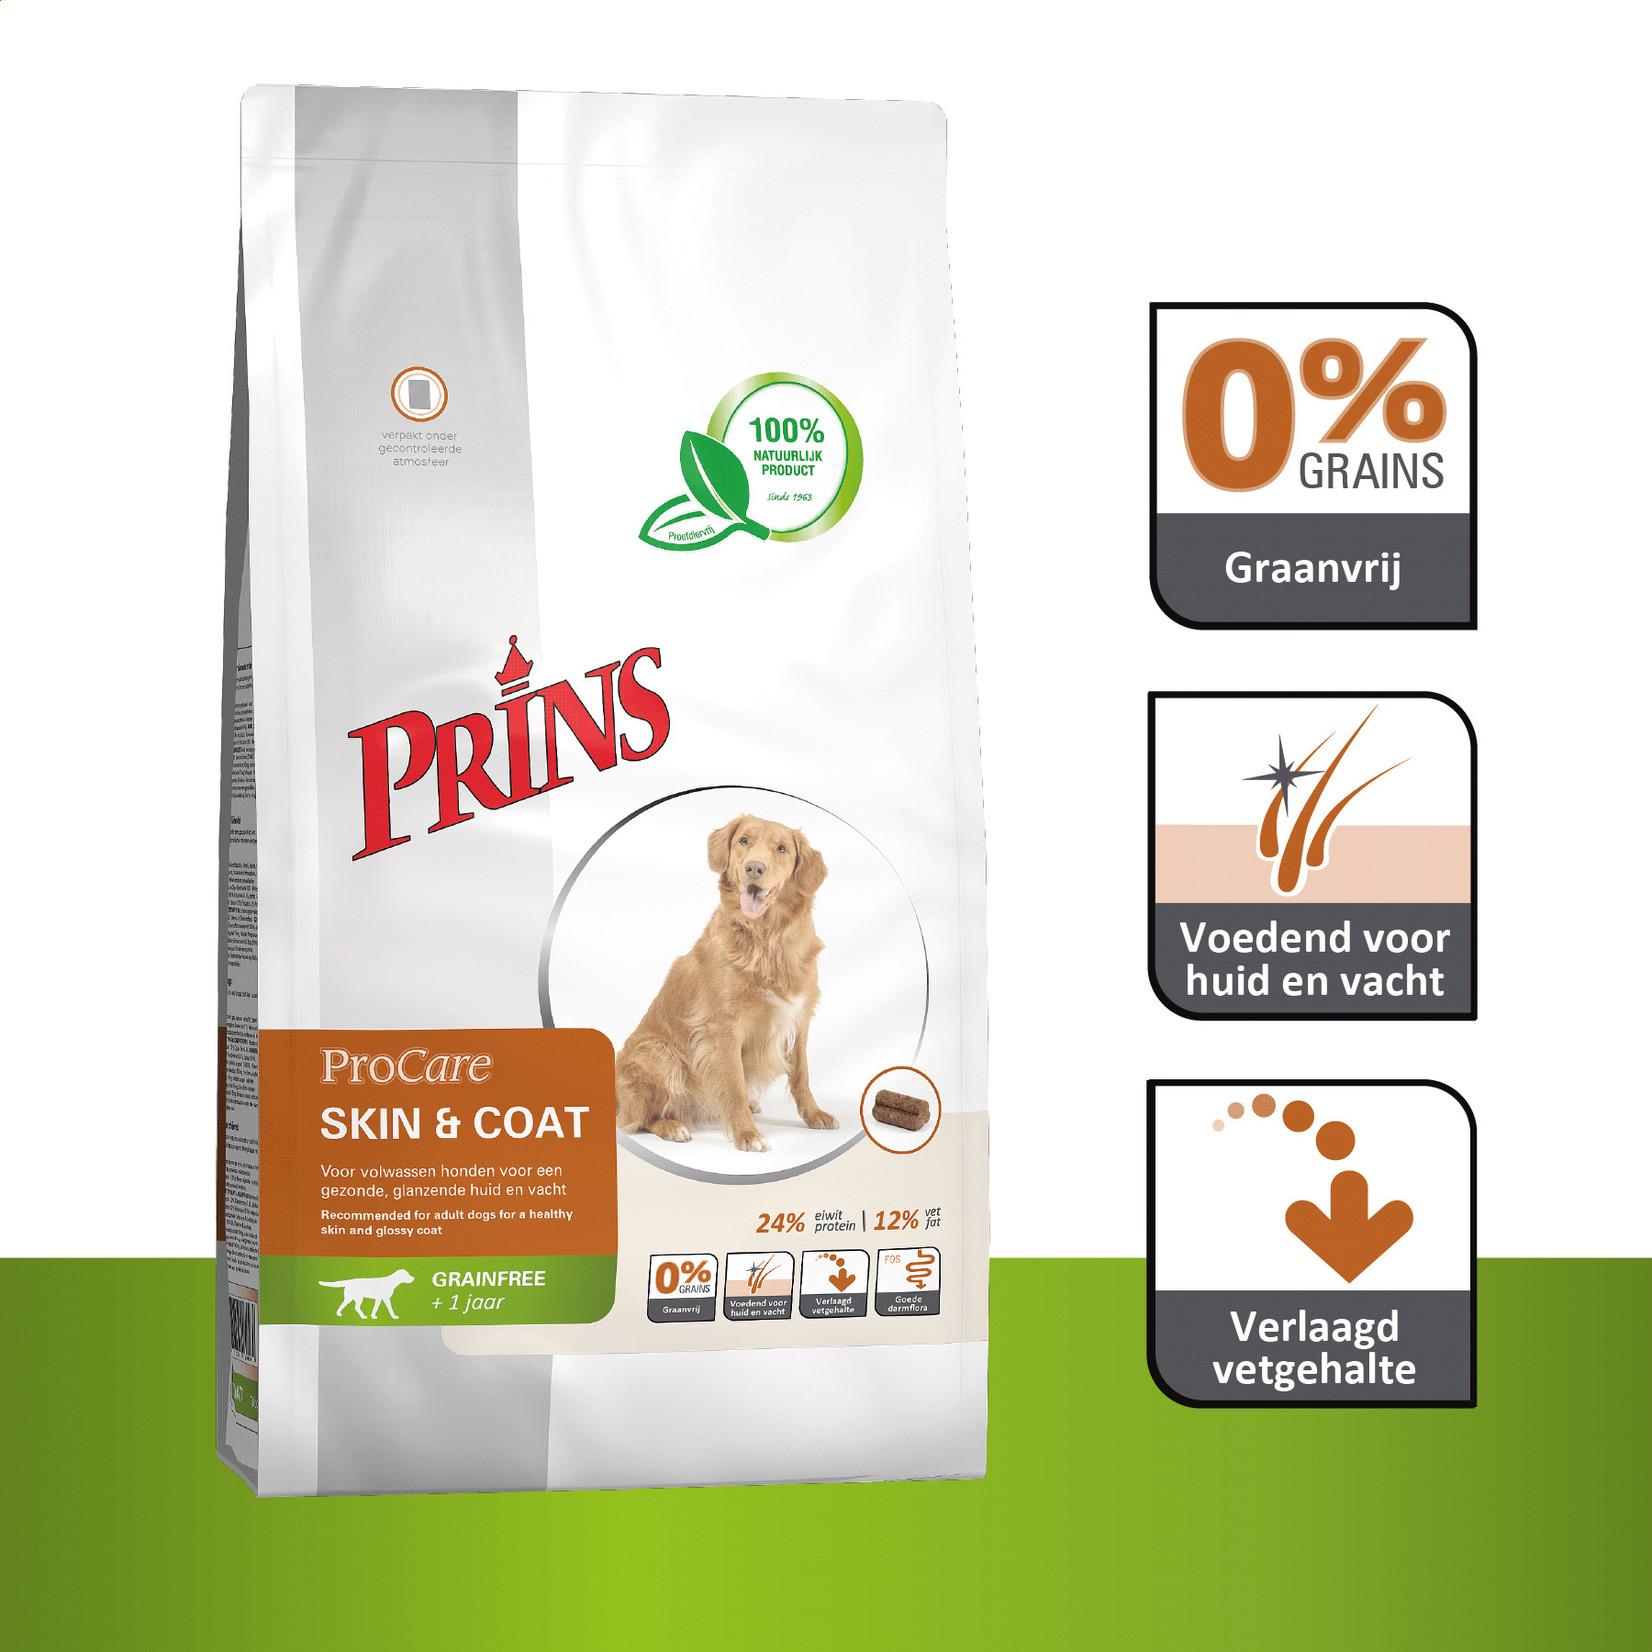 Prins Petfoods Prins Grainfree Skin&Coat